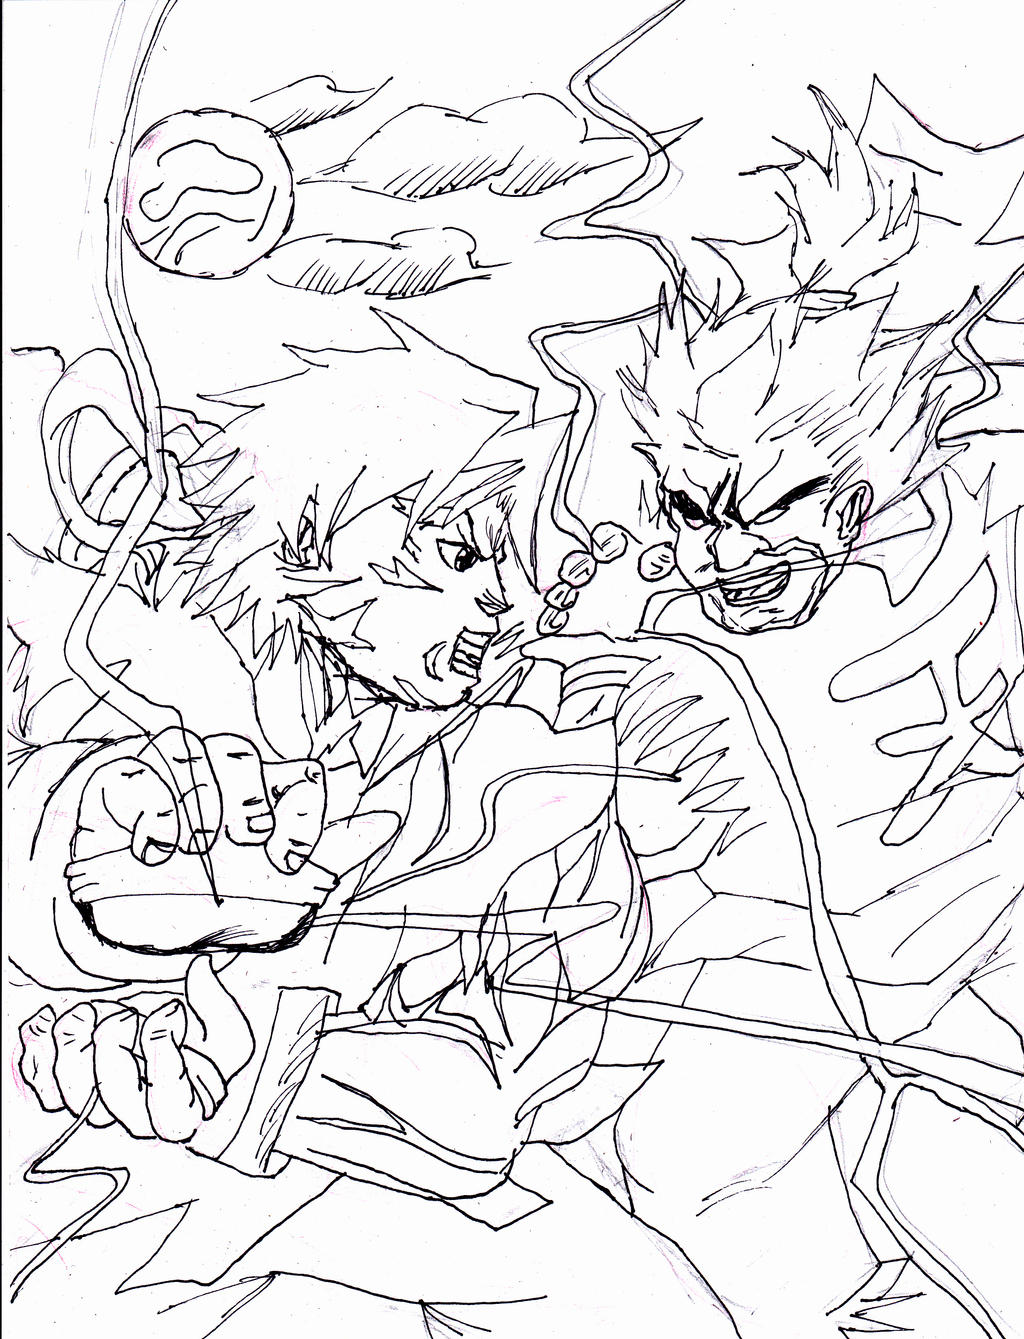 Ryu vs akuma by sugoroku hyru on deviantart for Ryu coloring pages